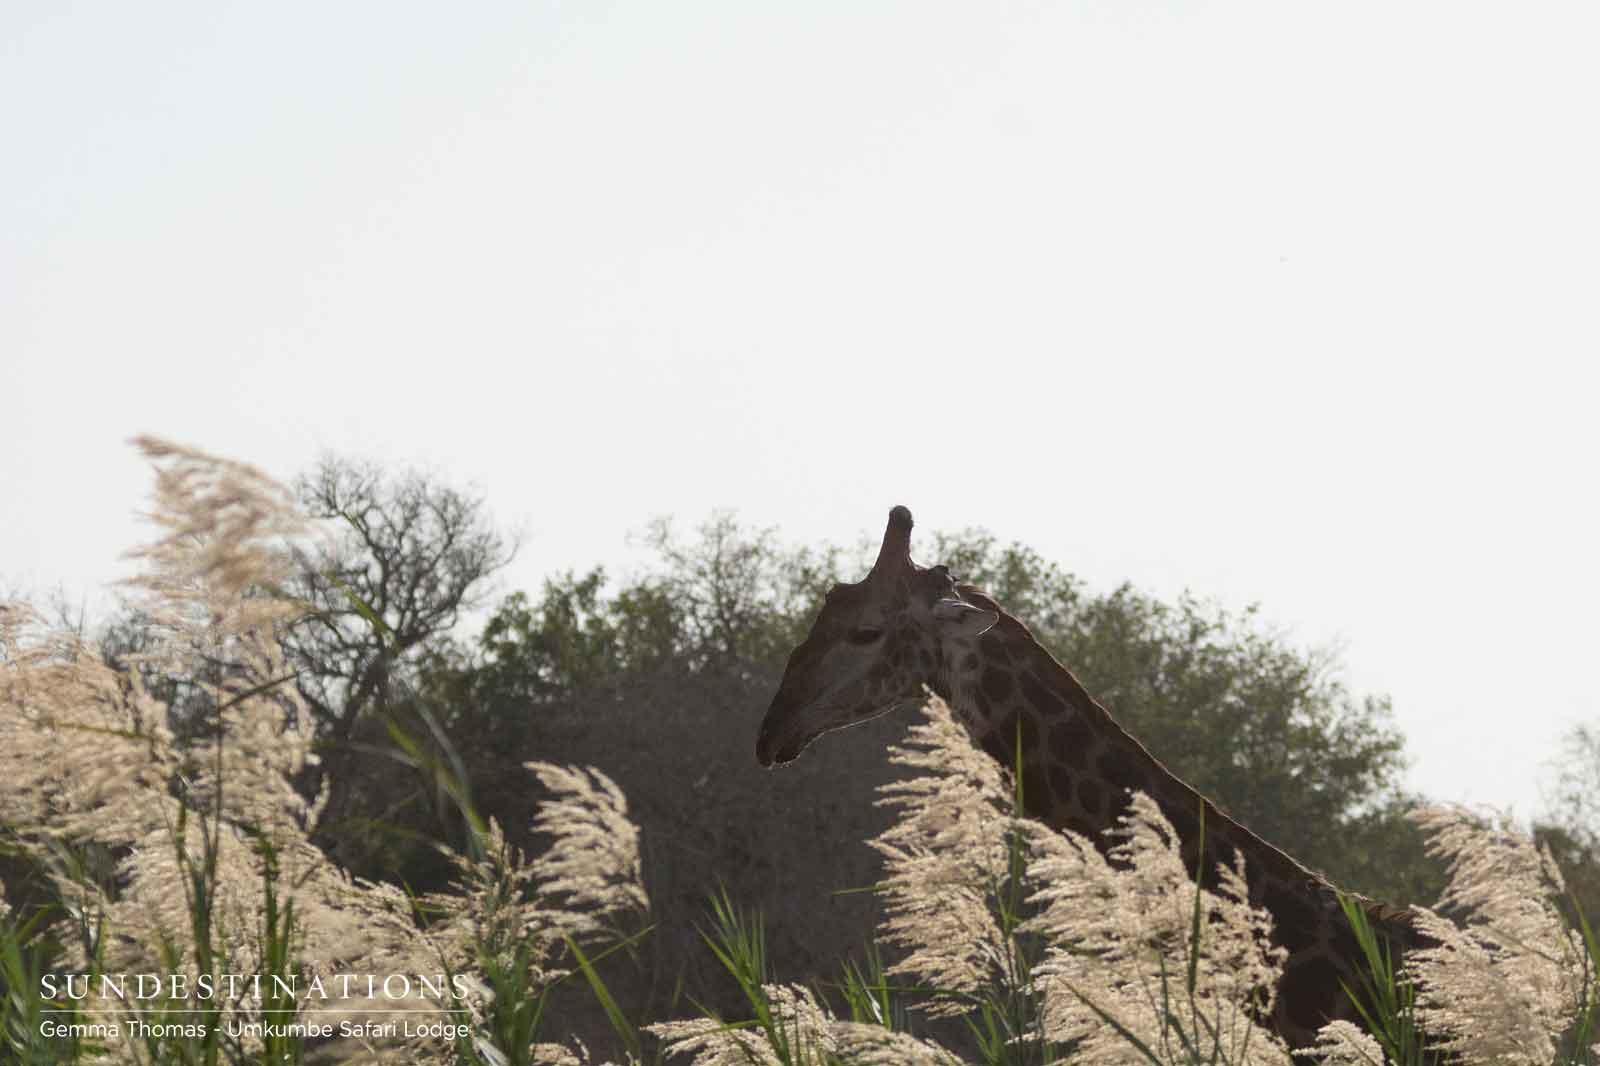 Giraffe at Umkumbe Safari Lodge